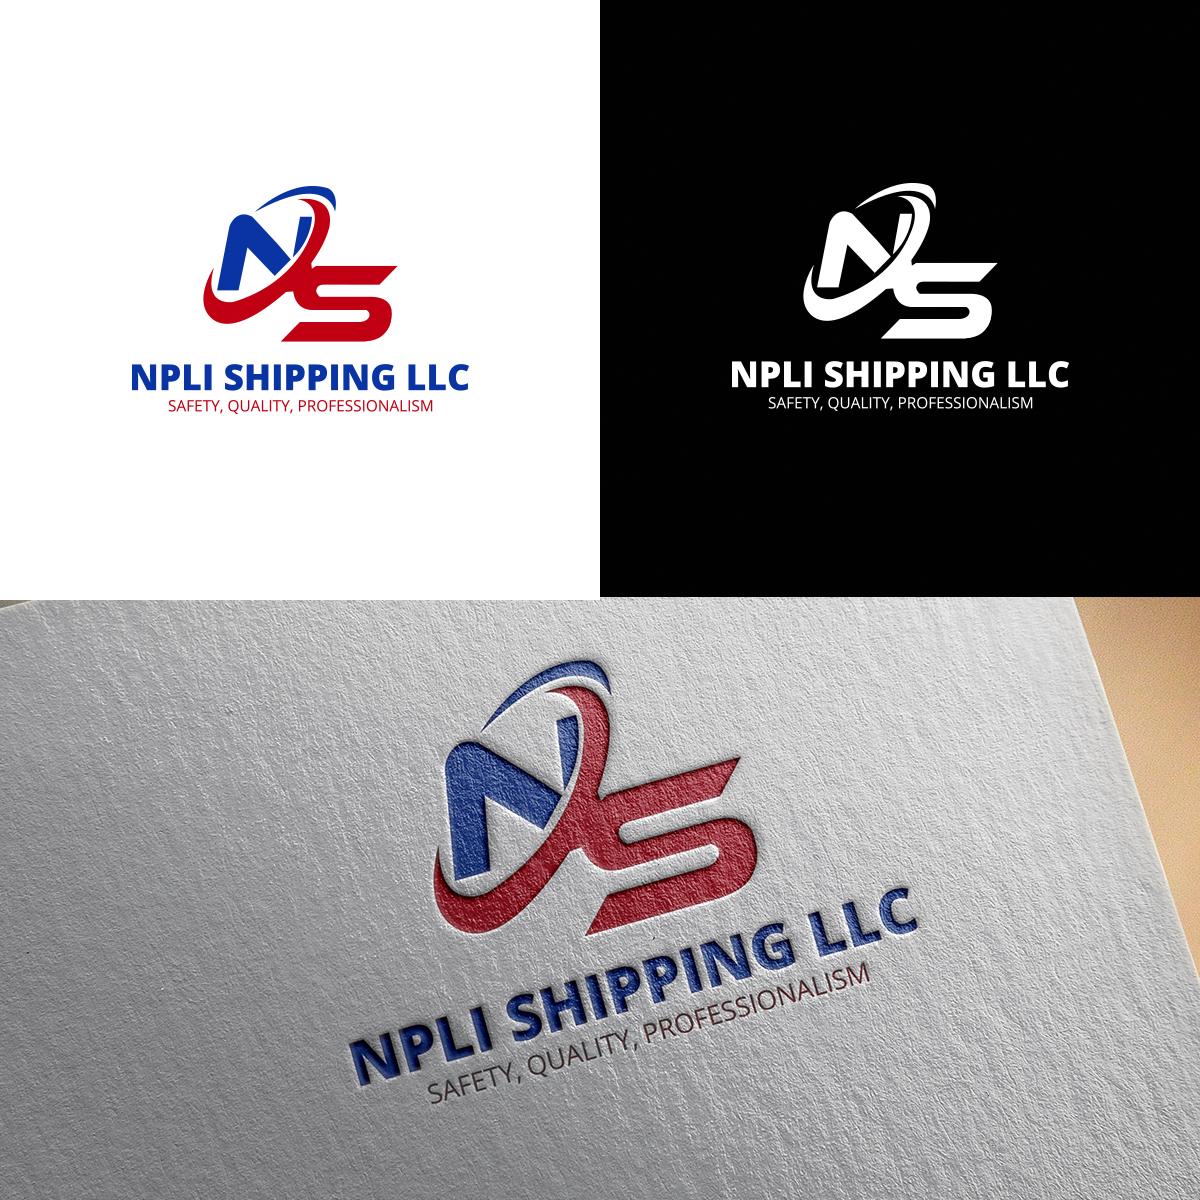 Boundless Technologies designs Logo  NPLI Shipping